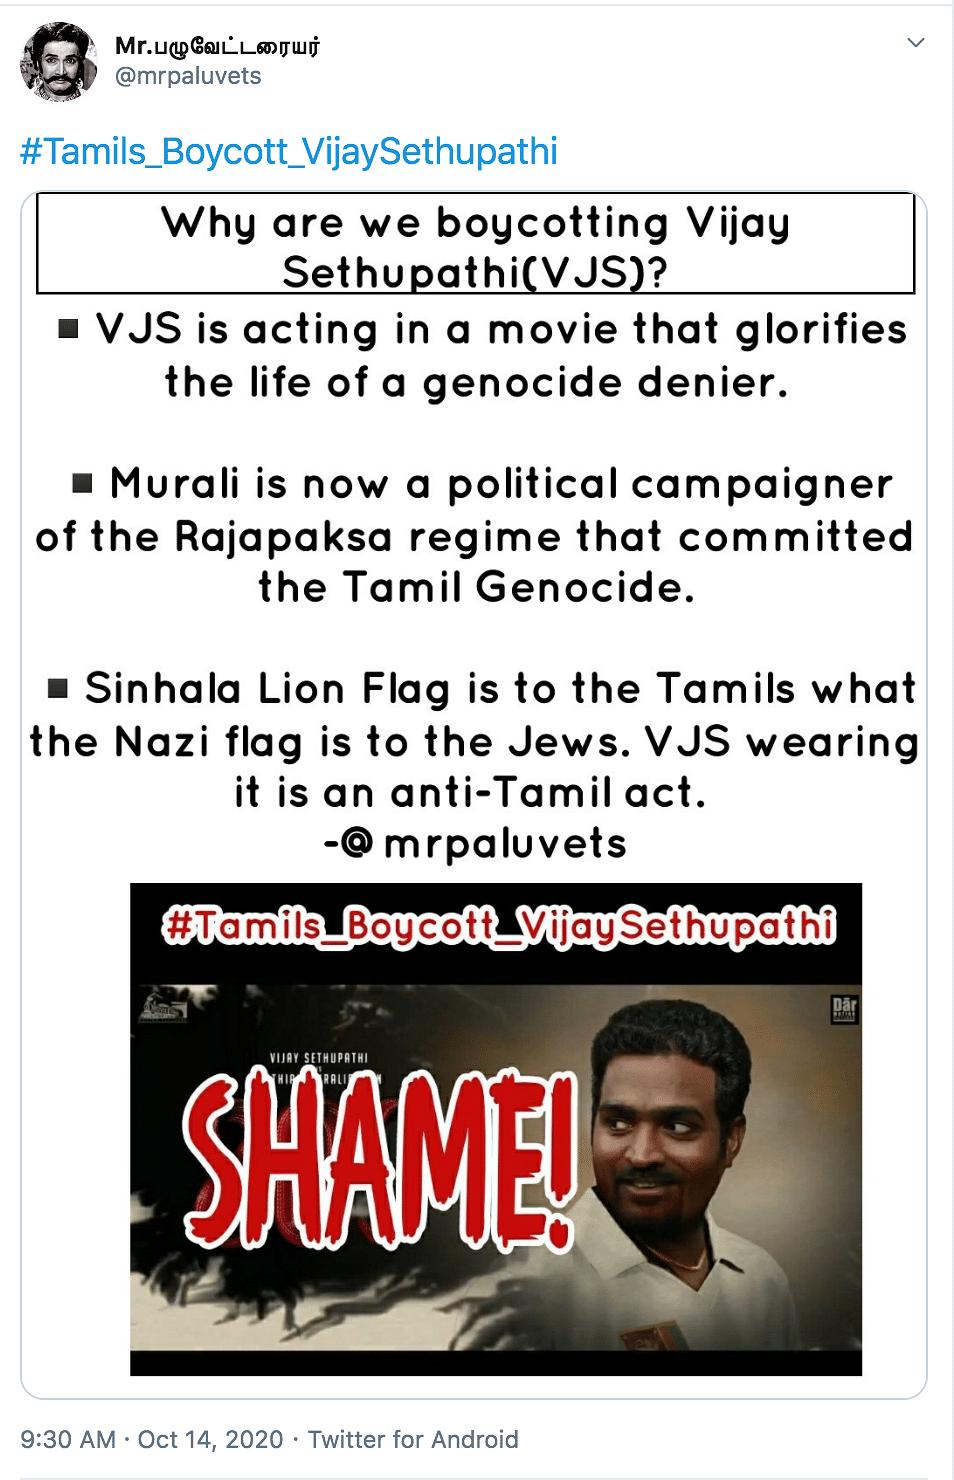 'Don't Hurt Tamil Sentiments:' Actor Vijay Sethupathi Slammed